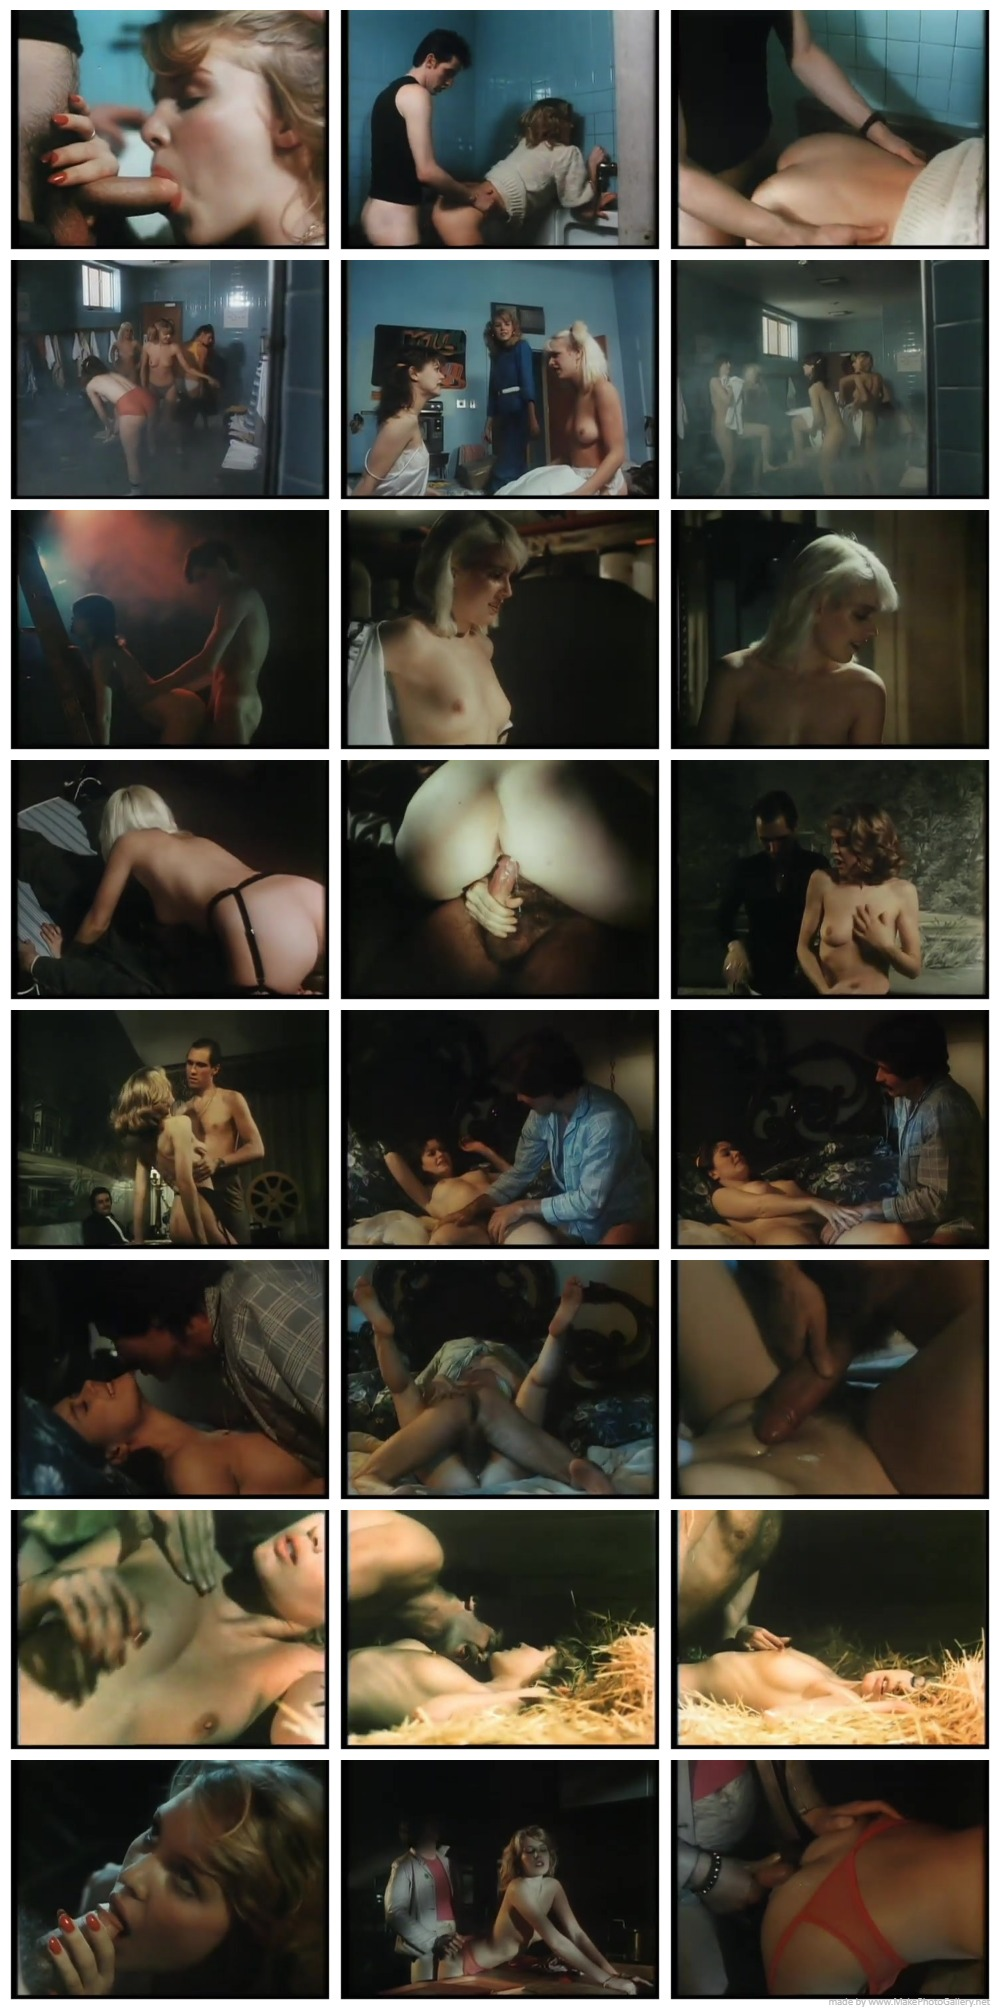 Sex Kino Erotika 1983 A Rob Kino